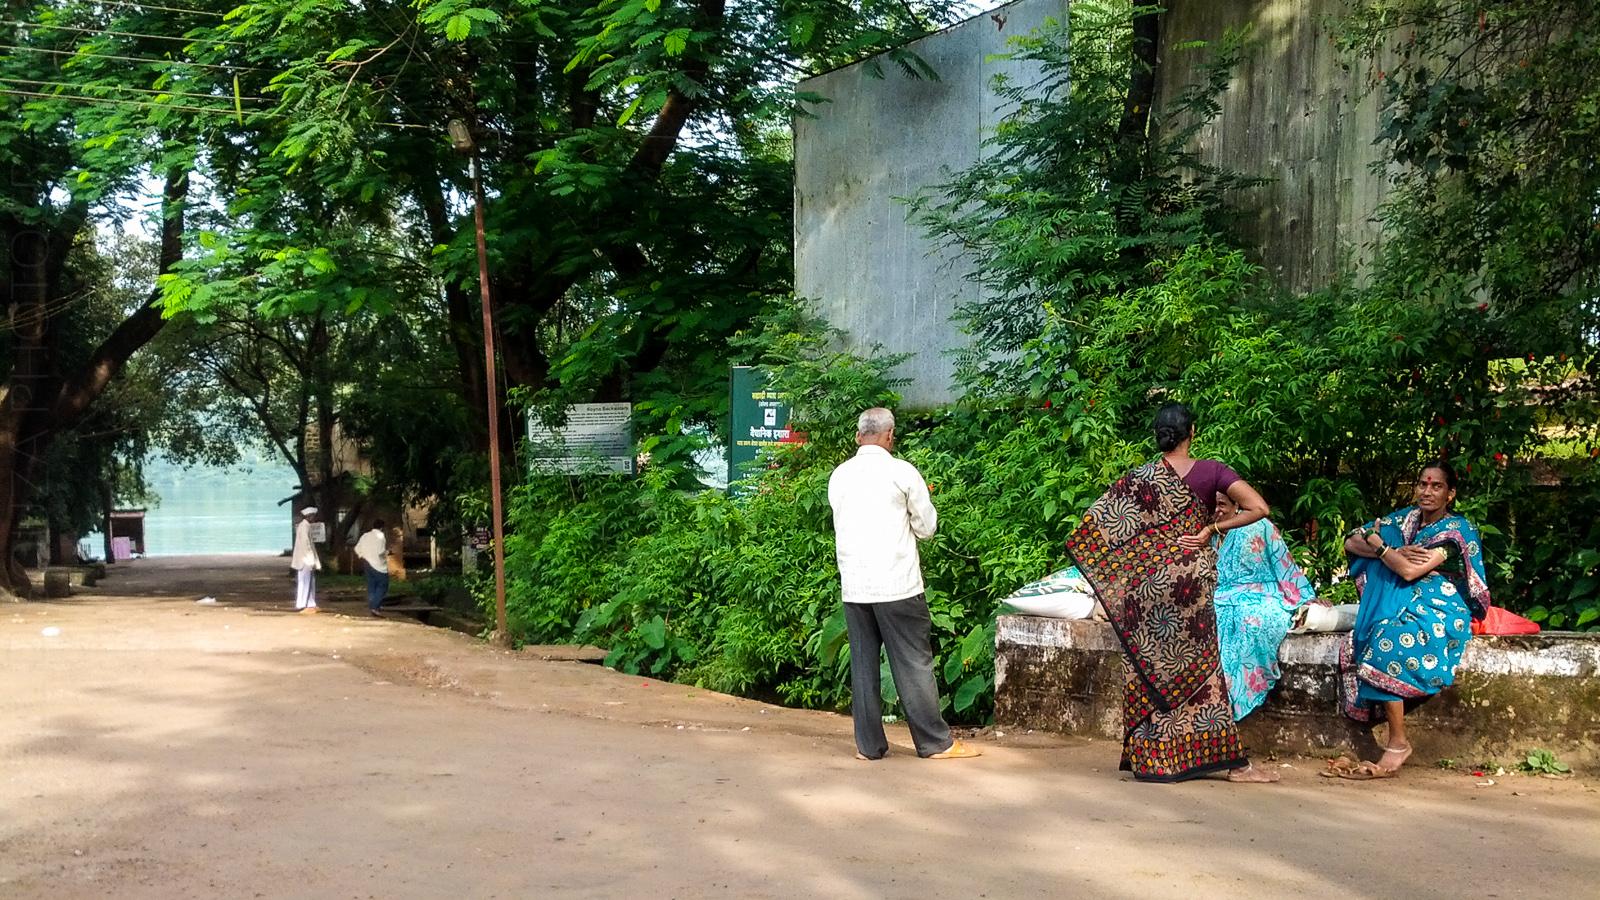 Bamnoli folk waiting for the bus